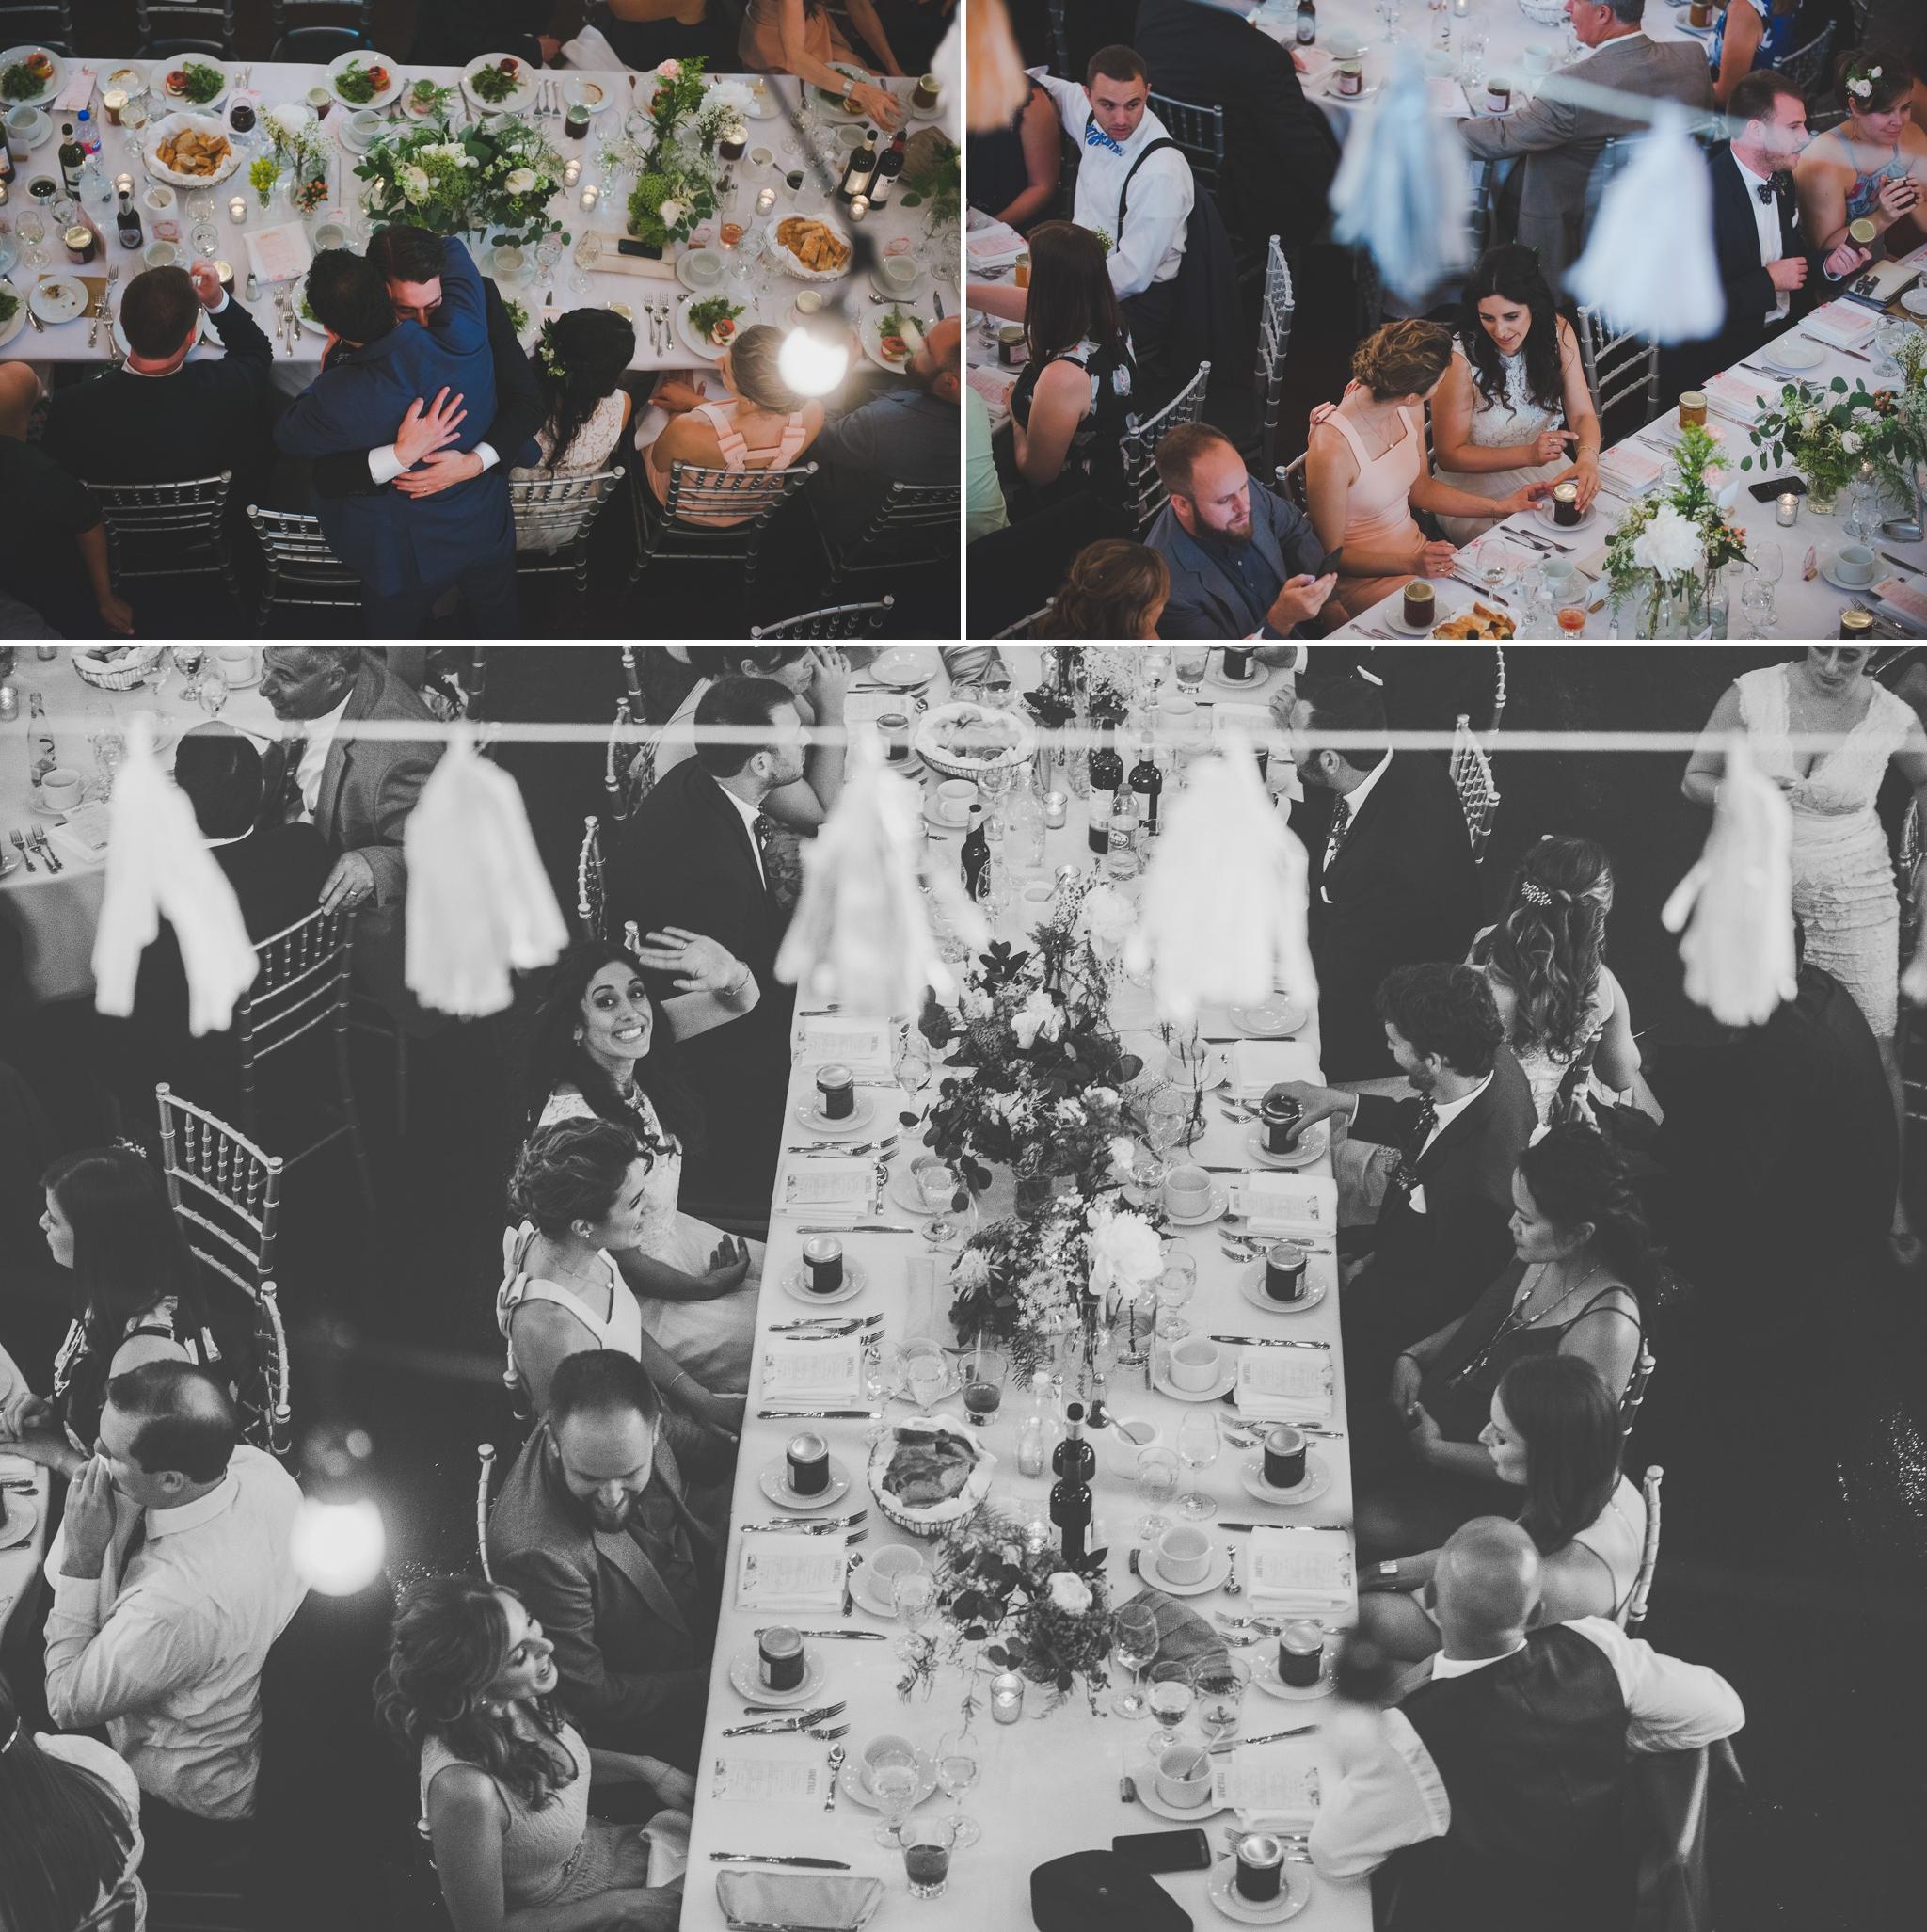 Downtown Toronto wedding, Toronto Wedding, brick, urban, urban toronto wedding, urban wedding photographer, urban wedding photographer, Toronto Wedding Photographer, Downtown Toronto, Toronto Photographer, Berkeley Church, Berkeley Events, Berkeley fieldhouse, bride, groom, bride and groom, couple, bridal portrait, portrait, romantic, intimate, church, church wedding, dramatic light, window light, unique location, candids, wedding guests, ceremony, bride, groom, wedding ceremony, aisle, musician, cocktail hour, party, wedding decor, wedding tables, wedding gifts, table settings, food, wedding food, desserts, wedding details